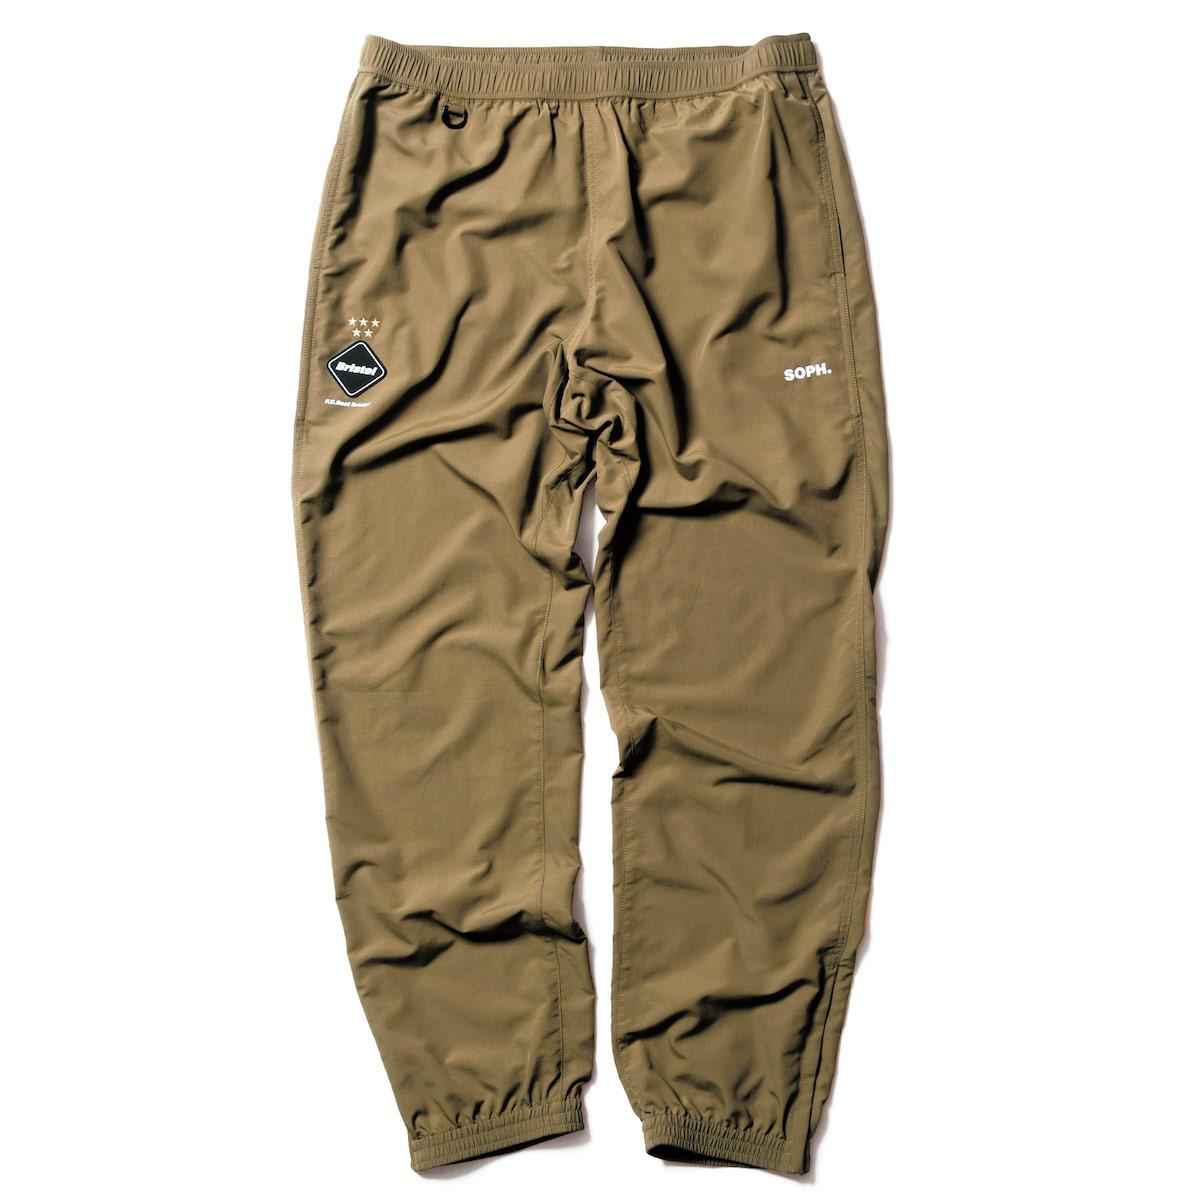 F.C.Real Bristol / NYLON EASY LONG PANTS (Khaki)